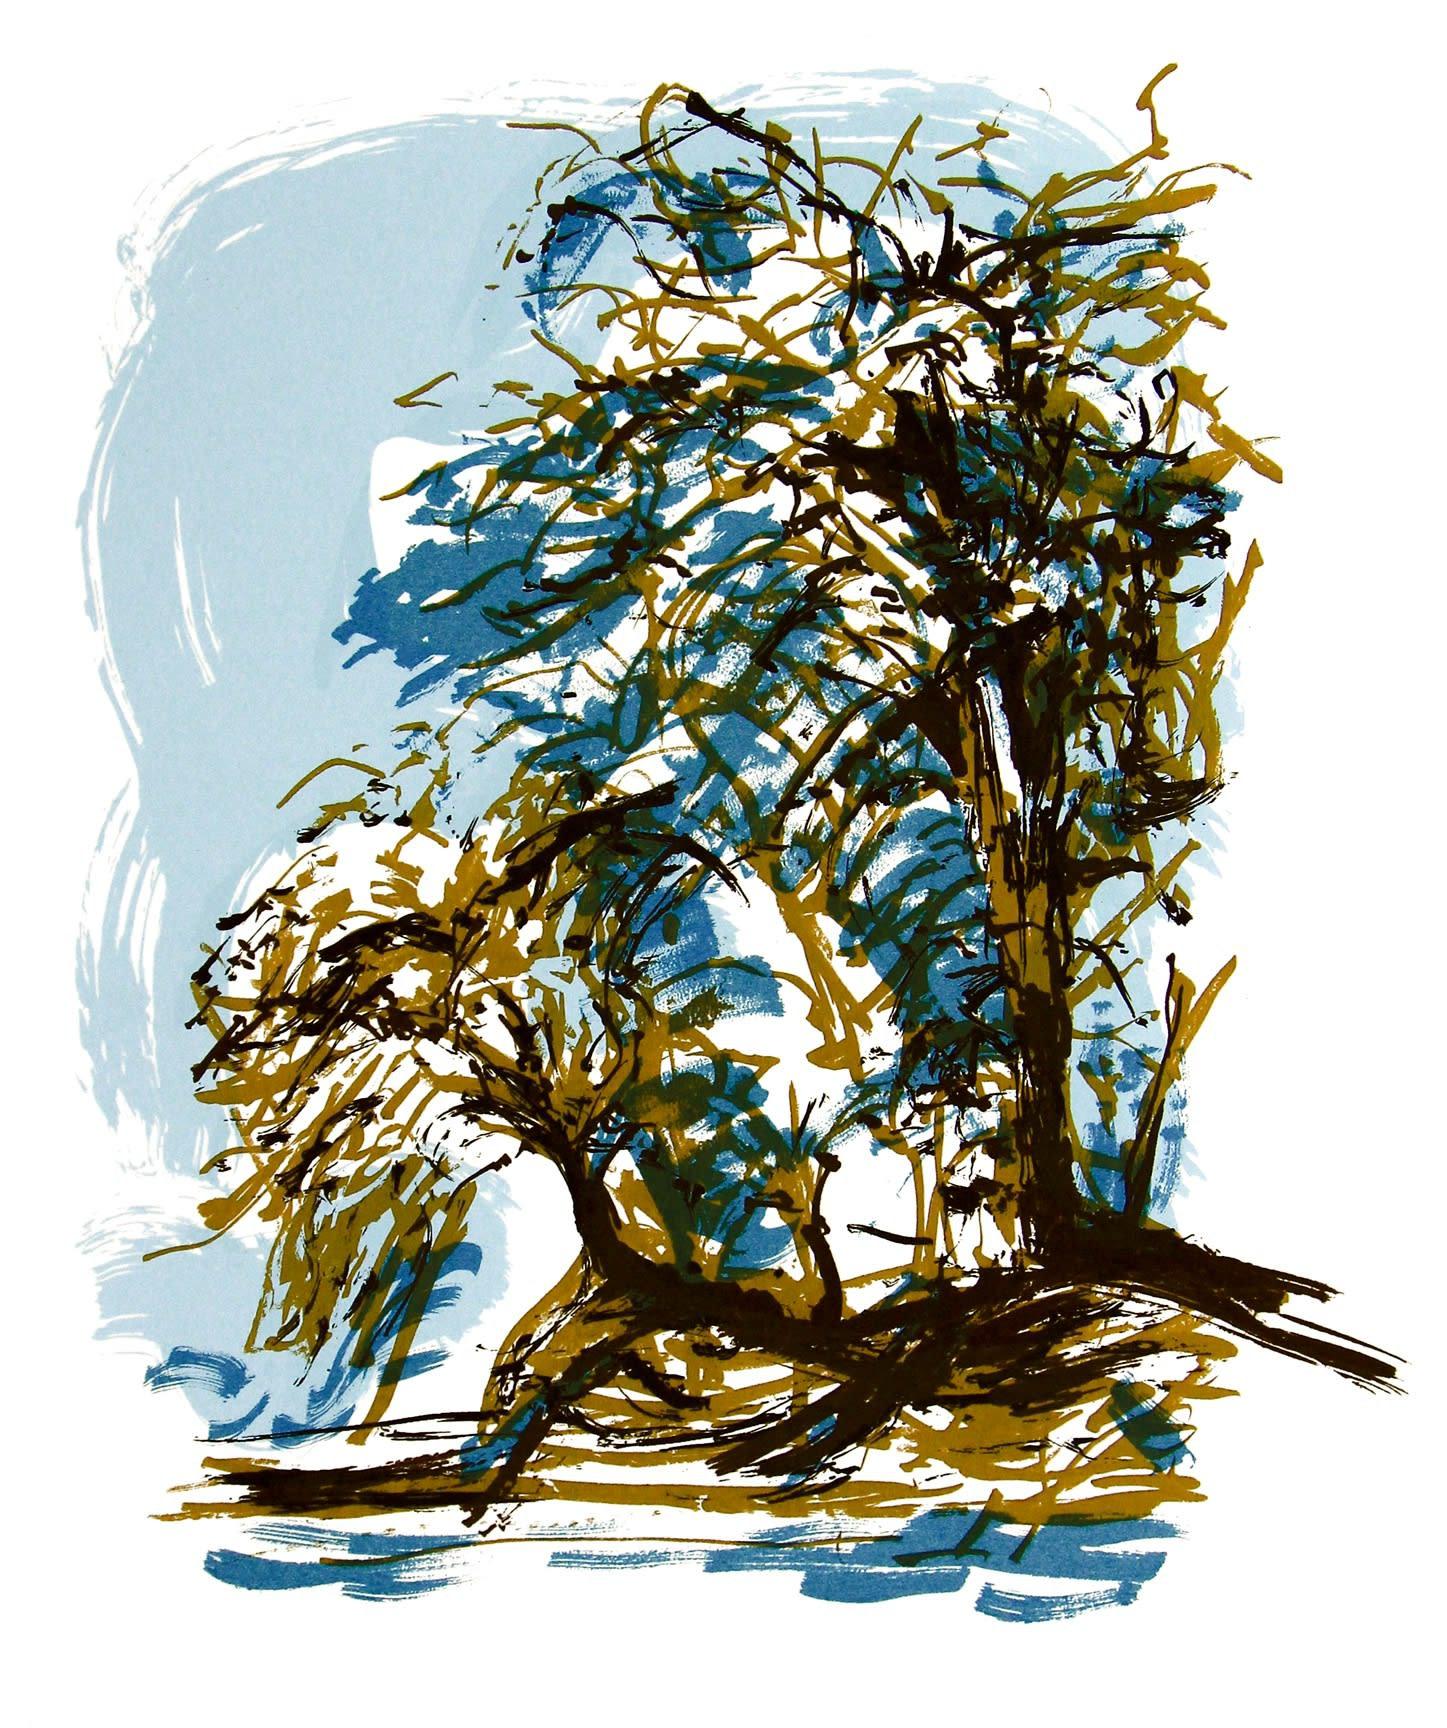 "<span class=""link fancybox-details-link""><a href=""/artists/321-denise-ballard-wyllie-are/works/11478/"">View Detail Page</a></span><div class=""artist""><span class=""artist""><strong>Denise Ballard Wyllie ARE</strong></span></div><div class=""title""><em>Cherry Blossom Front Winter Introspection</em></div><div class=""medium"">screenprint</div><div class=""dimensions"">51.5 x 44 cm framed<br /> 28 x 24 cm image szie<br /> </div><div class=""edition_details"">edition of 10</div><div class=""price"">£567.00 framed<br>£367.00 unframed</div>"